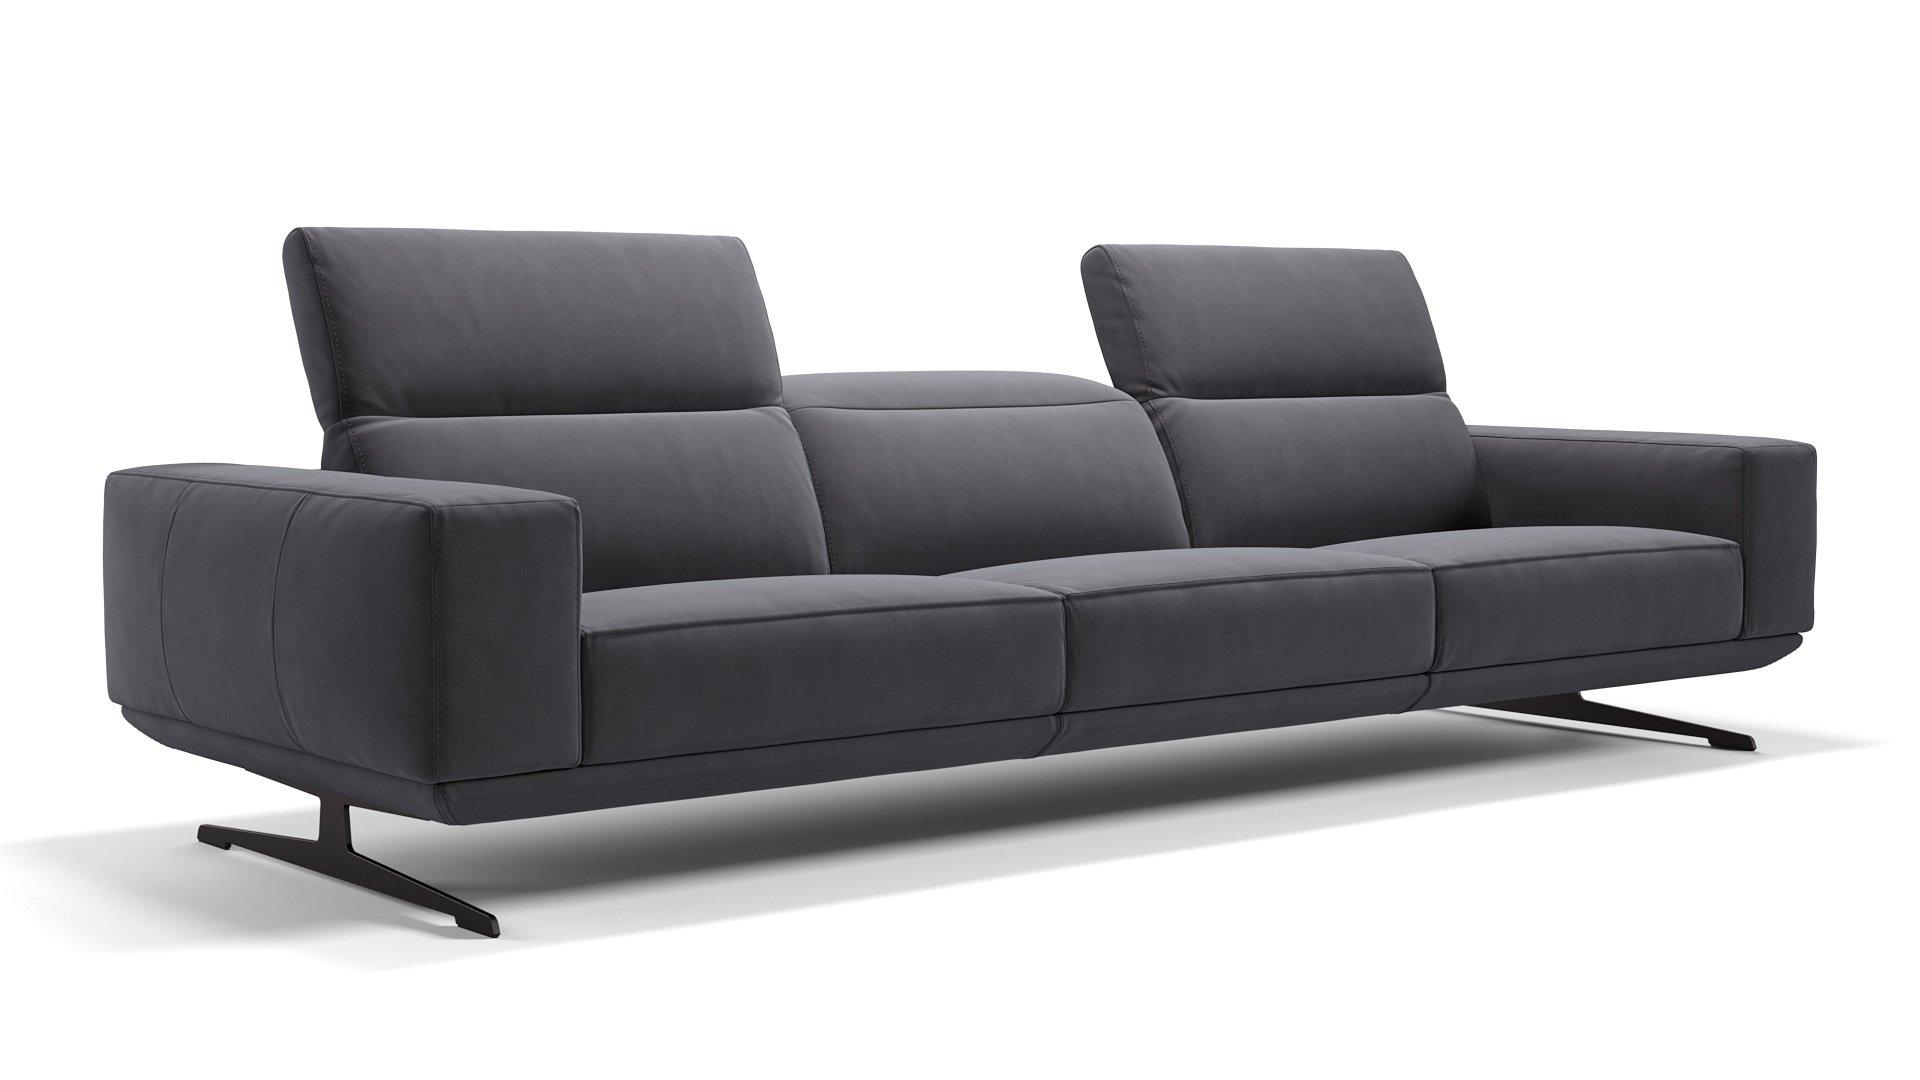 Stoff 3-Sitzer Sofa XXL MERANO